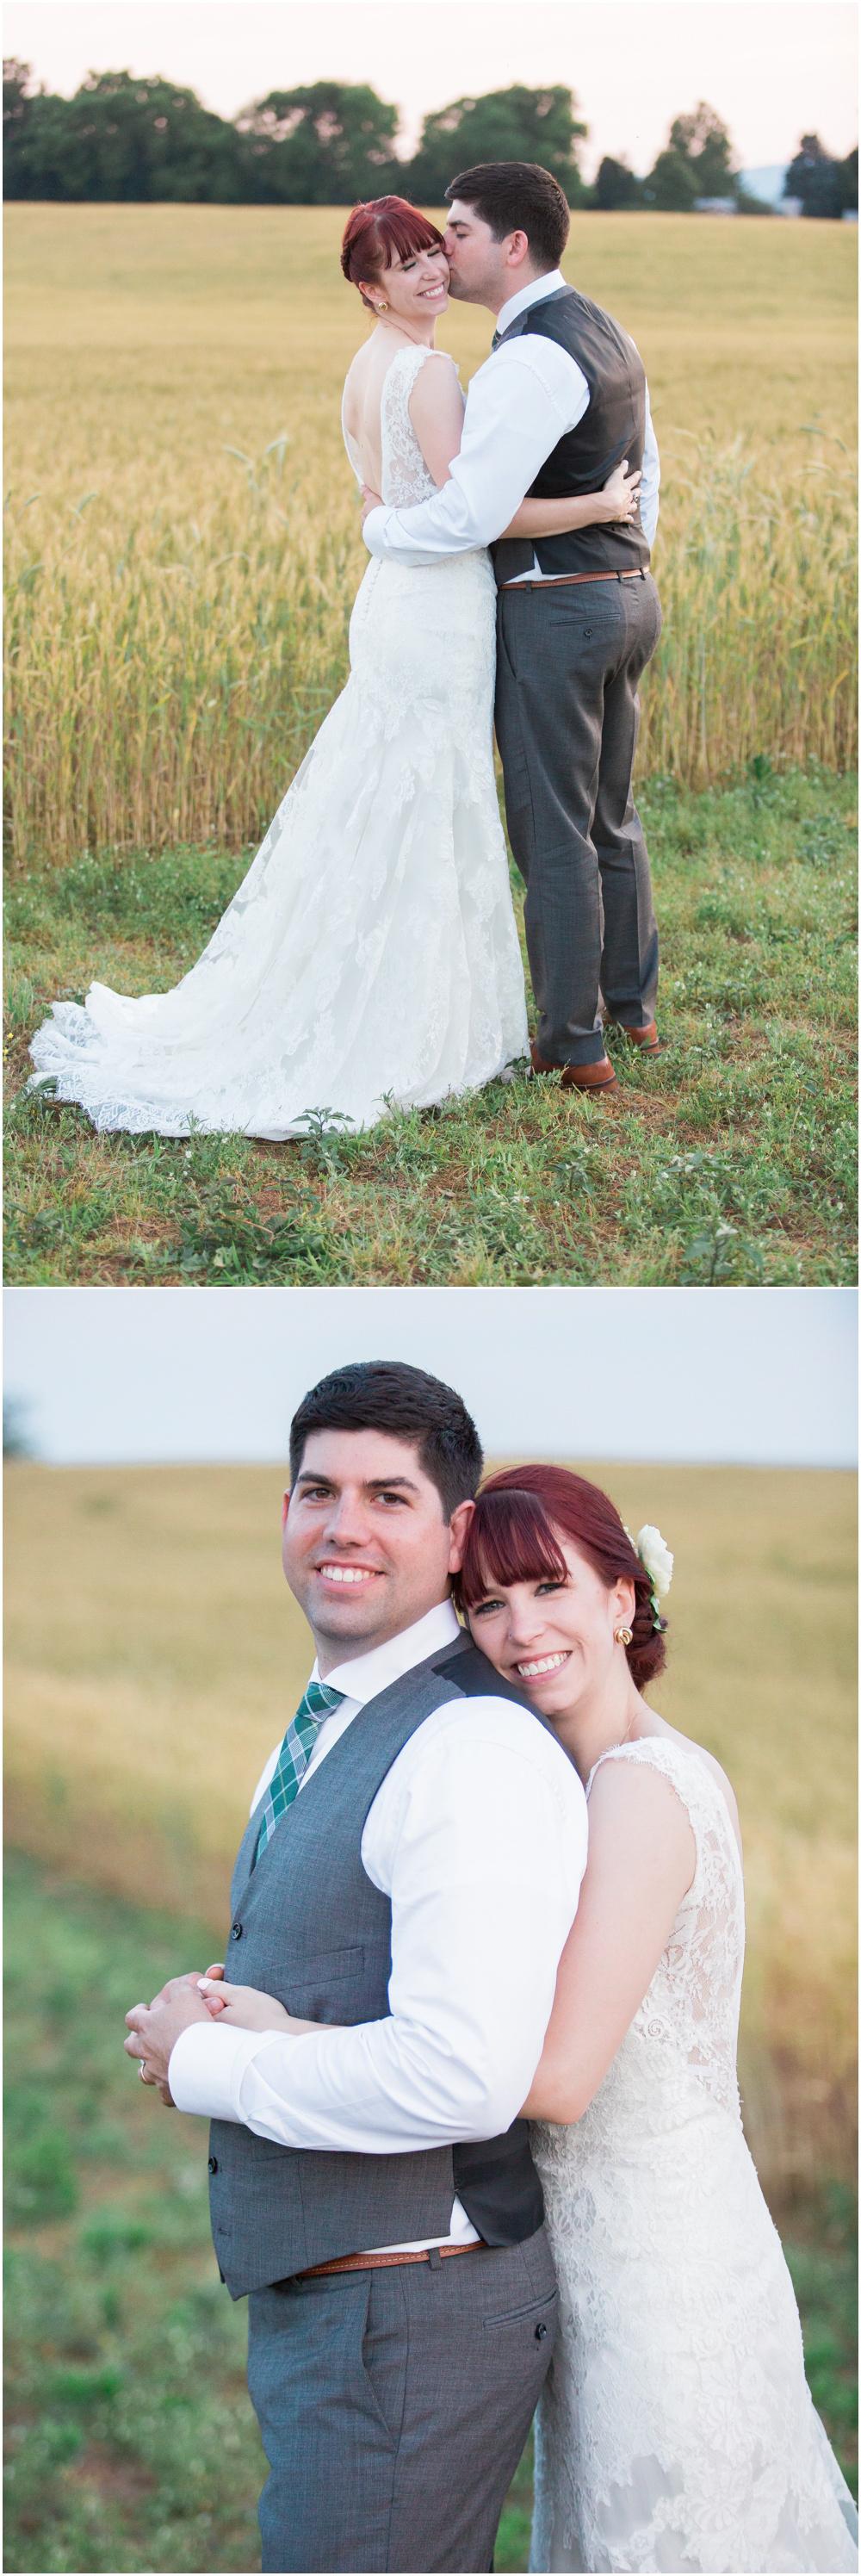 bethany-grace-photography-frederick-maryland-walkers-overlook-farm-wedding-41.JPG